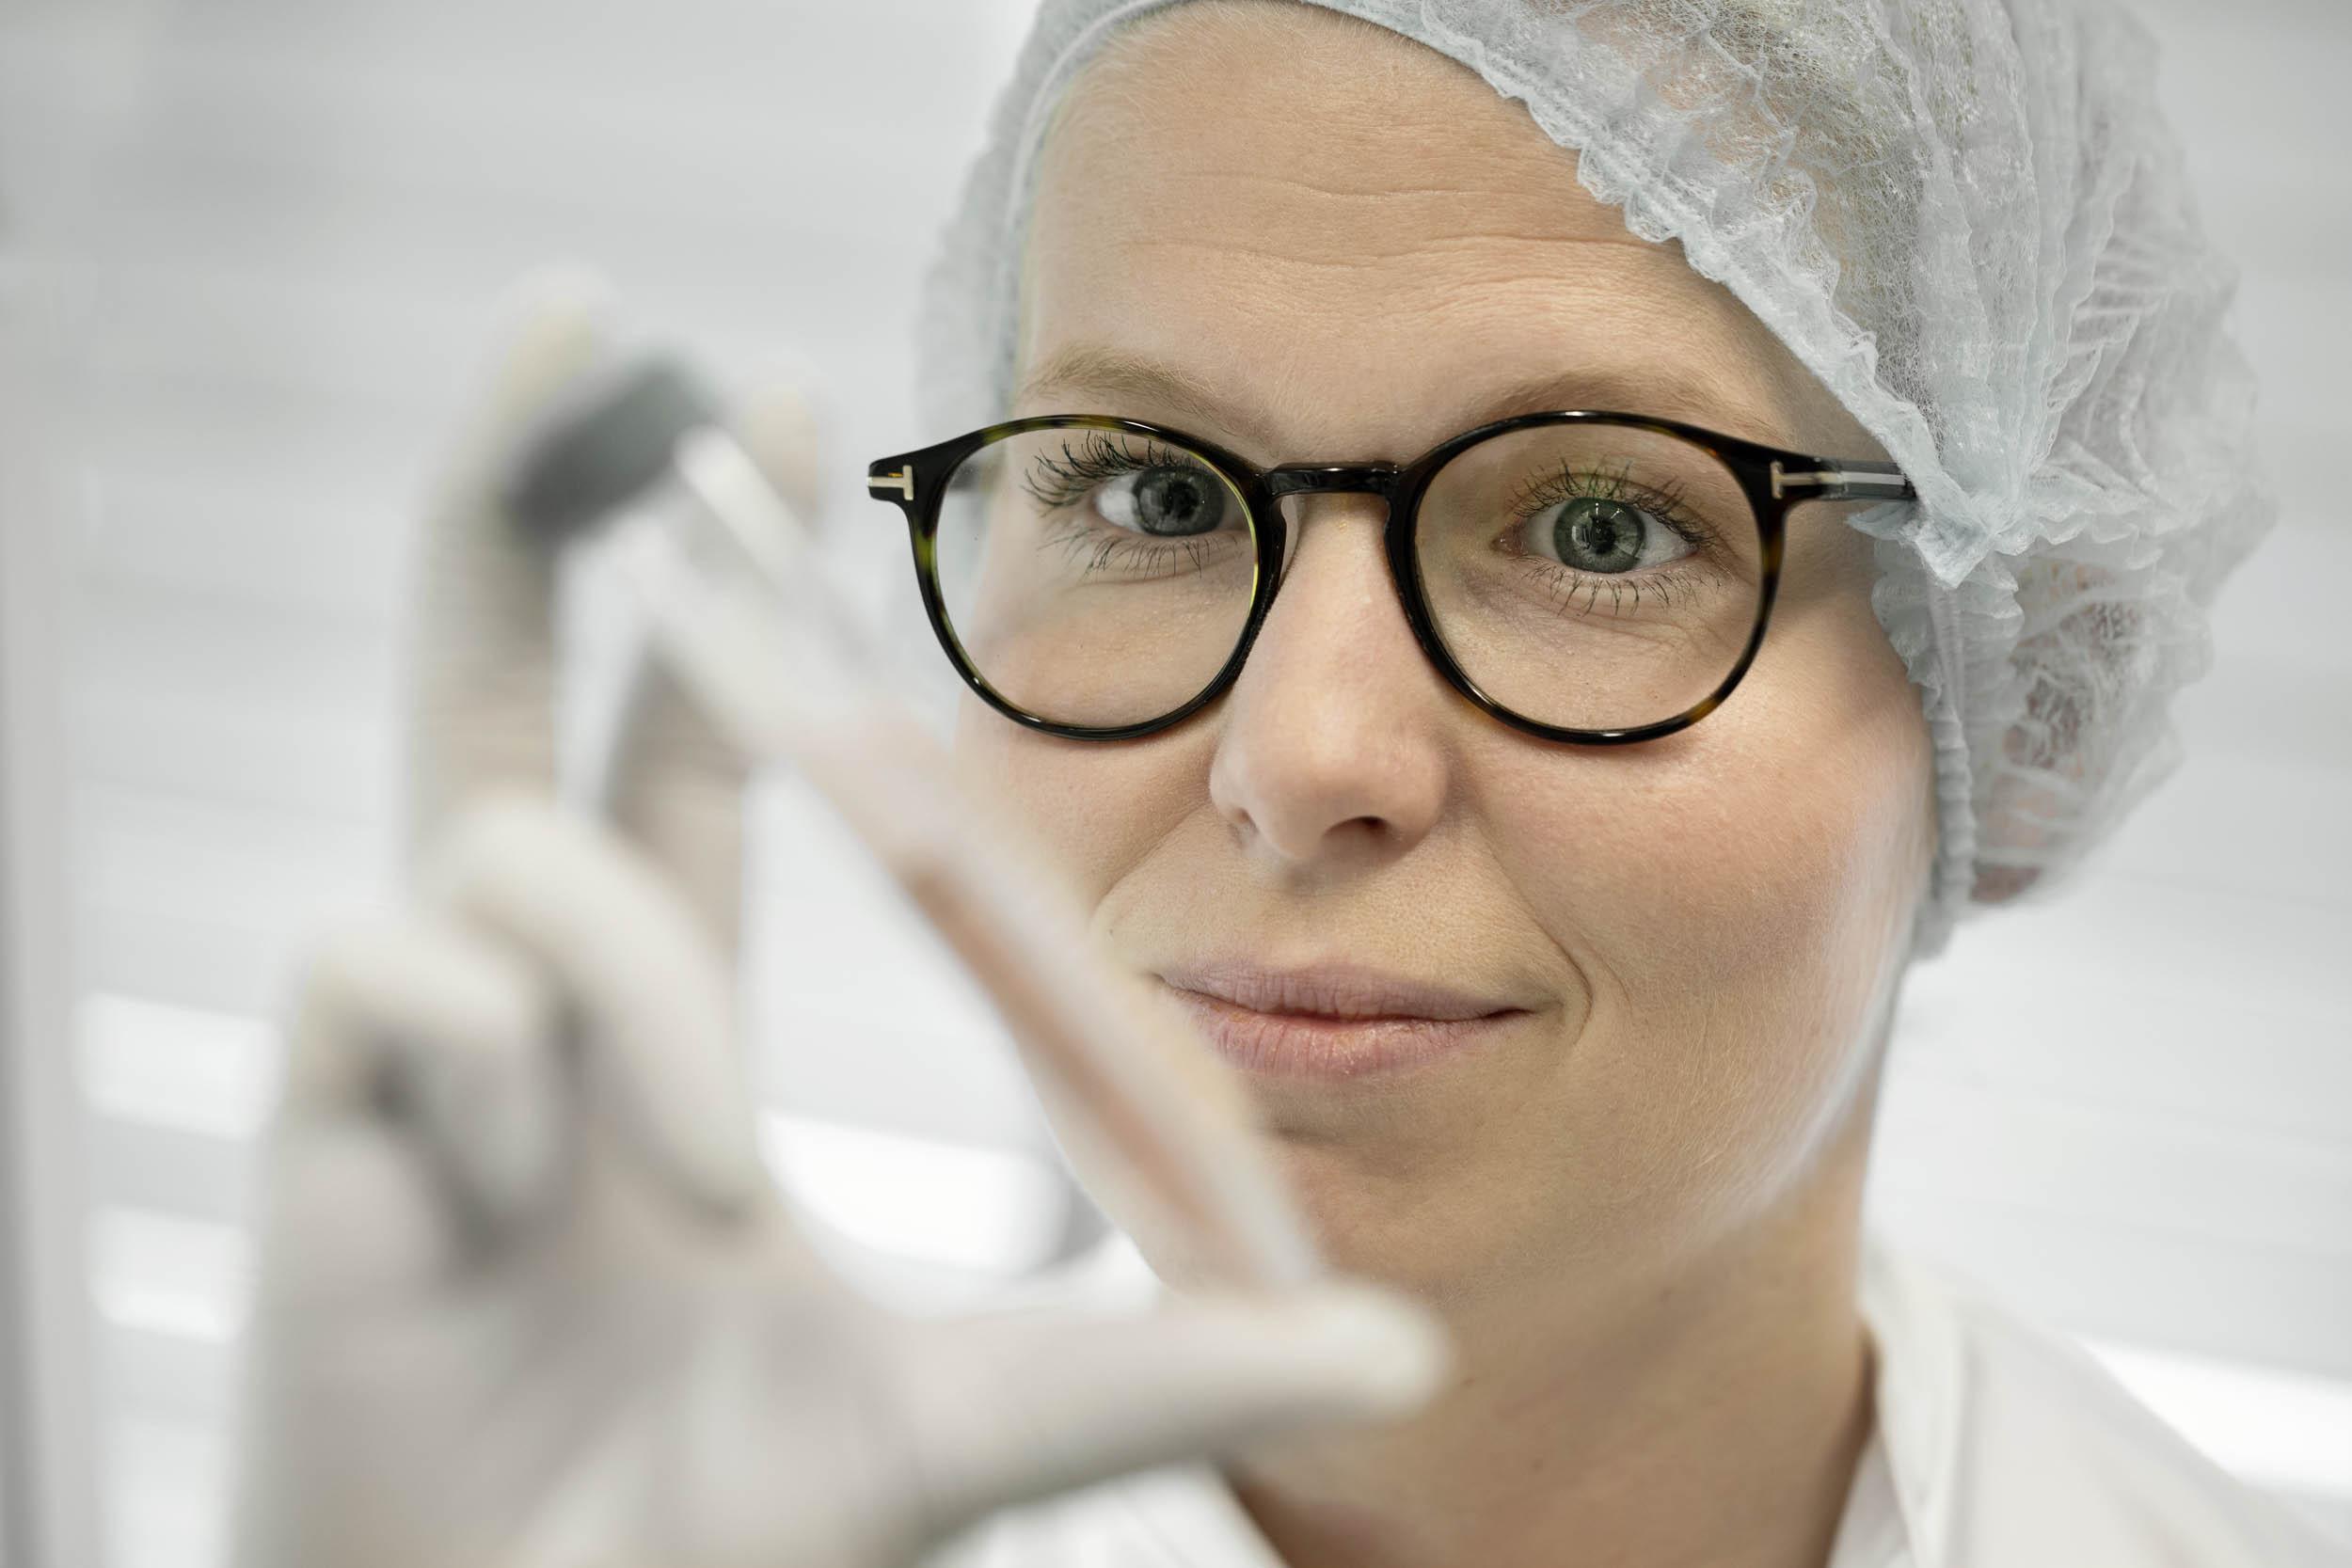 Lab personnel examine test tube with specimen